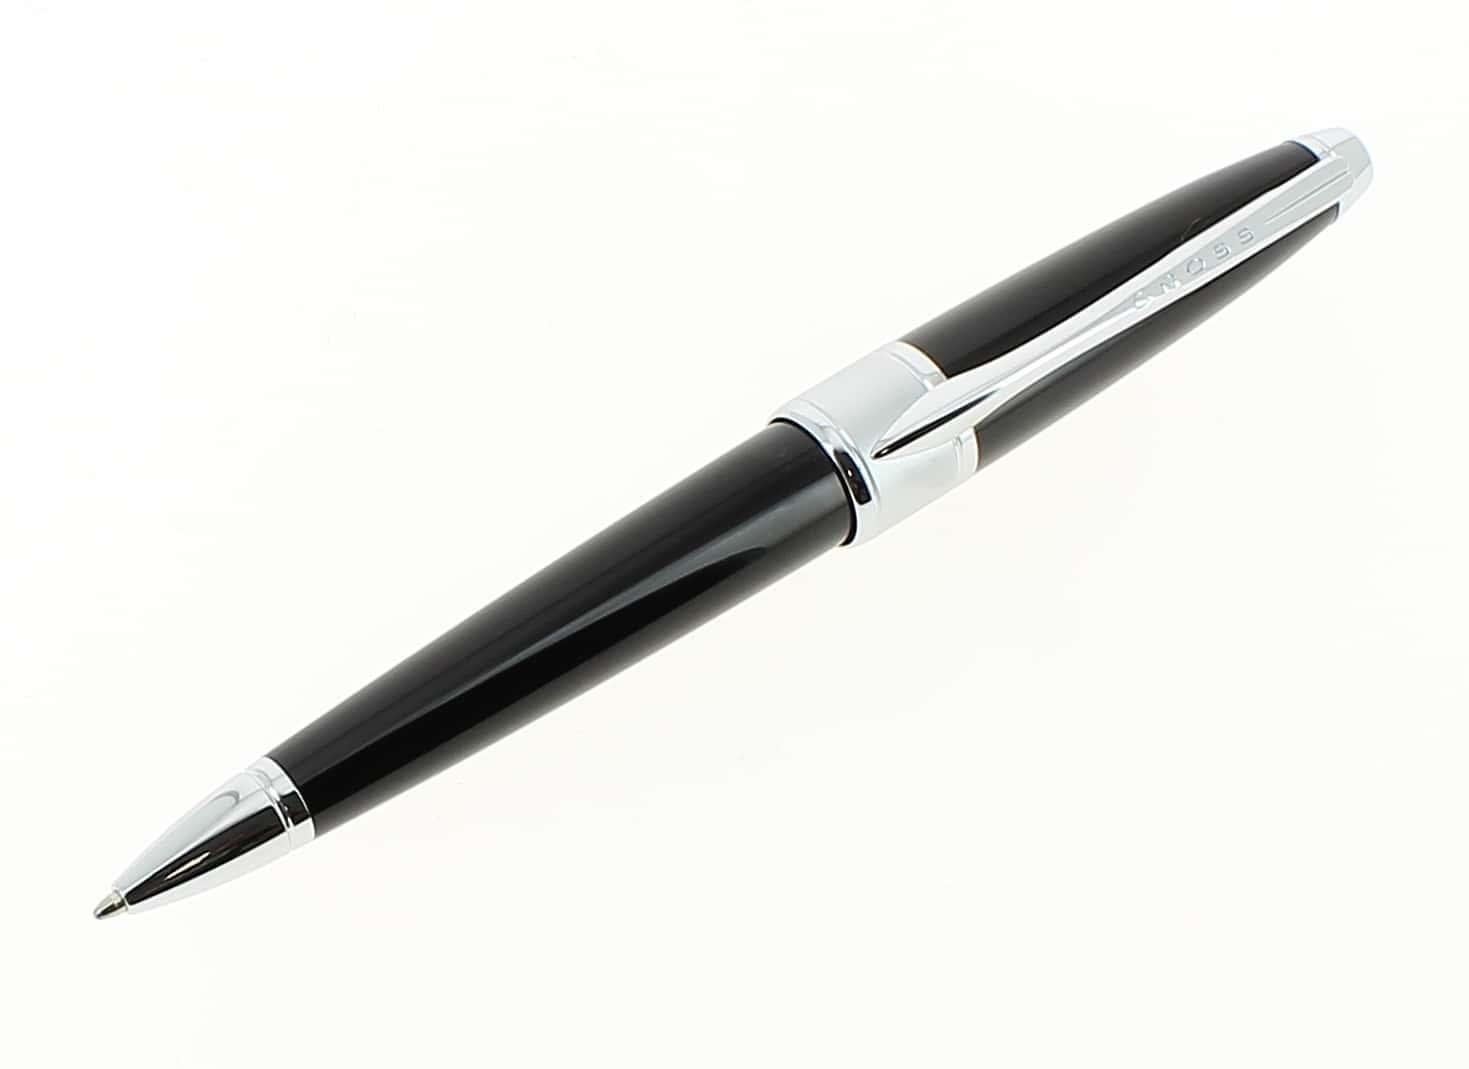 stylo bille cross apog e laque noire 110 00. Black Bedroom Furniture Sets. Home Design Ideas